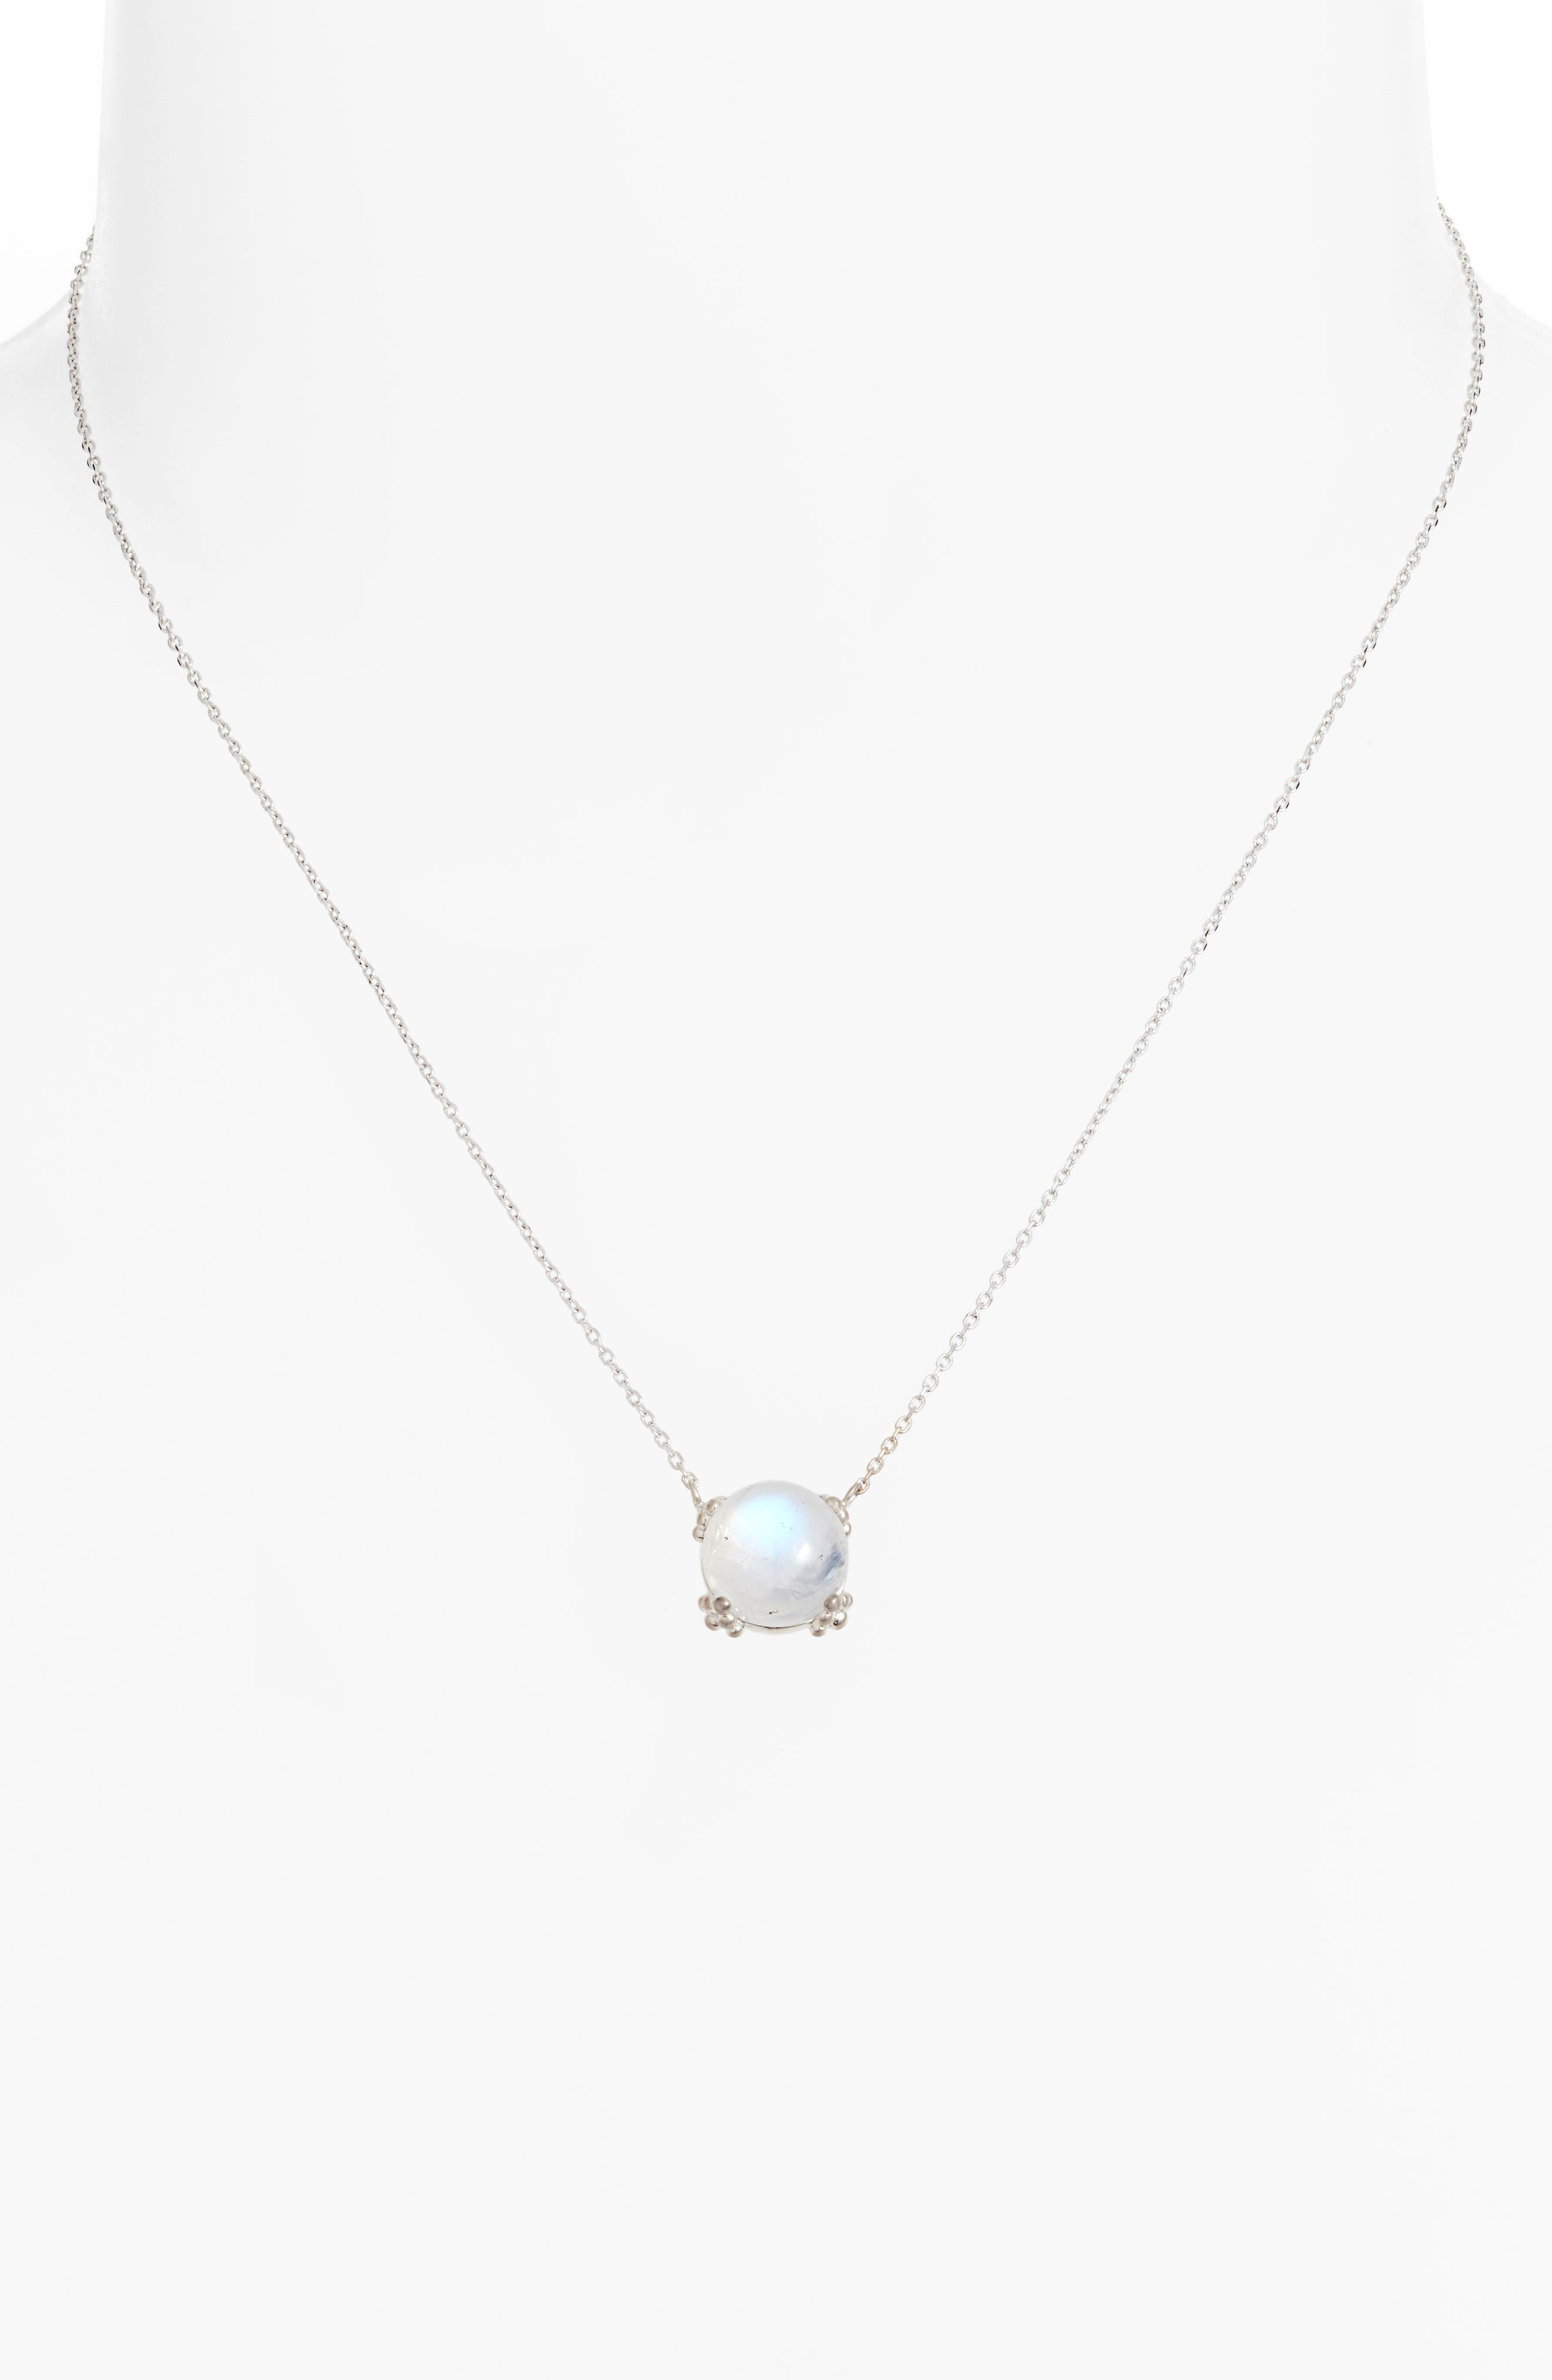 Dew Drop Cluster Moonstone Pendant Necklace,                             Alternate thumbnail 2, color,                             SILVER